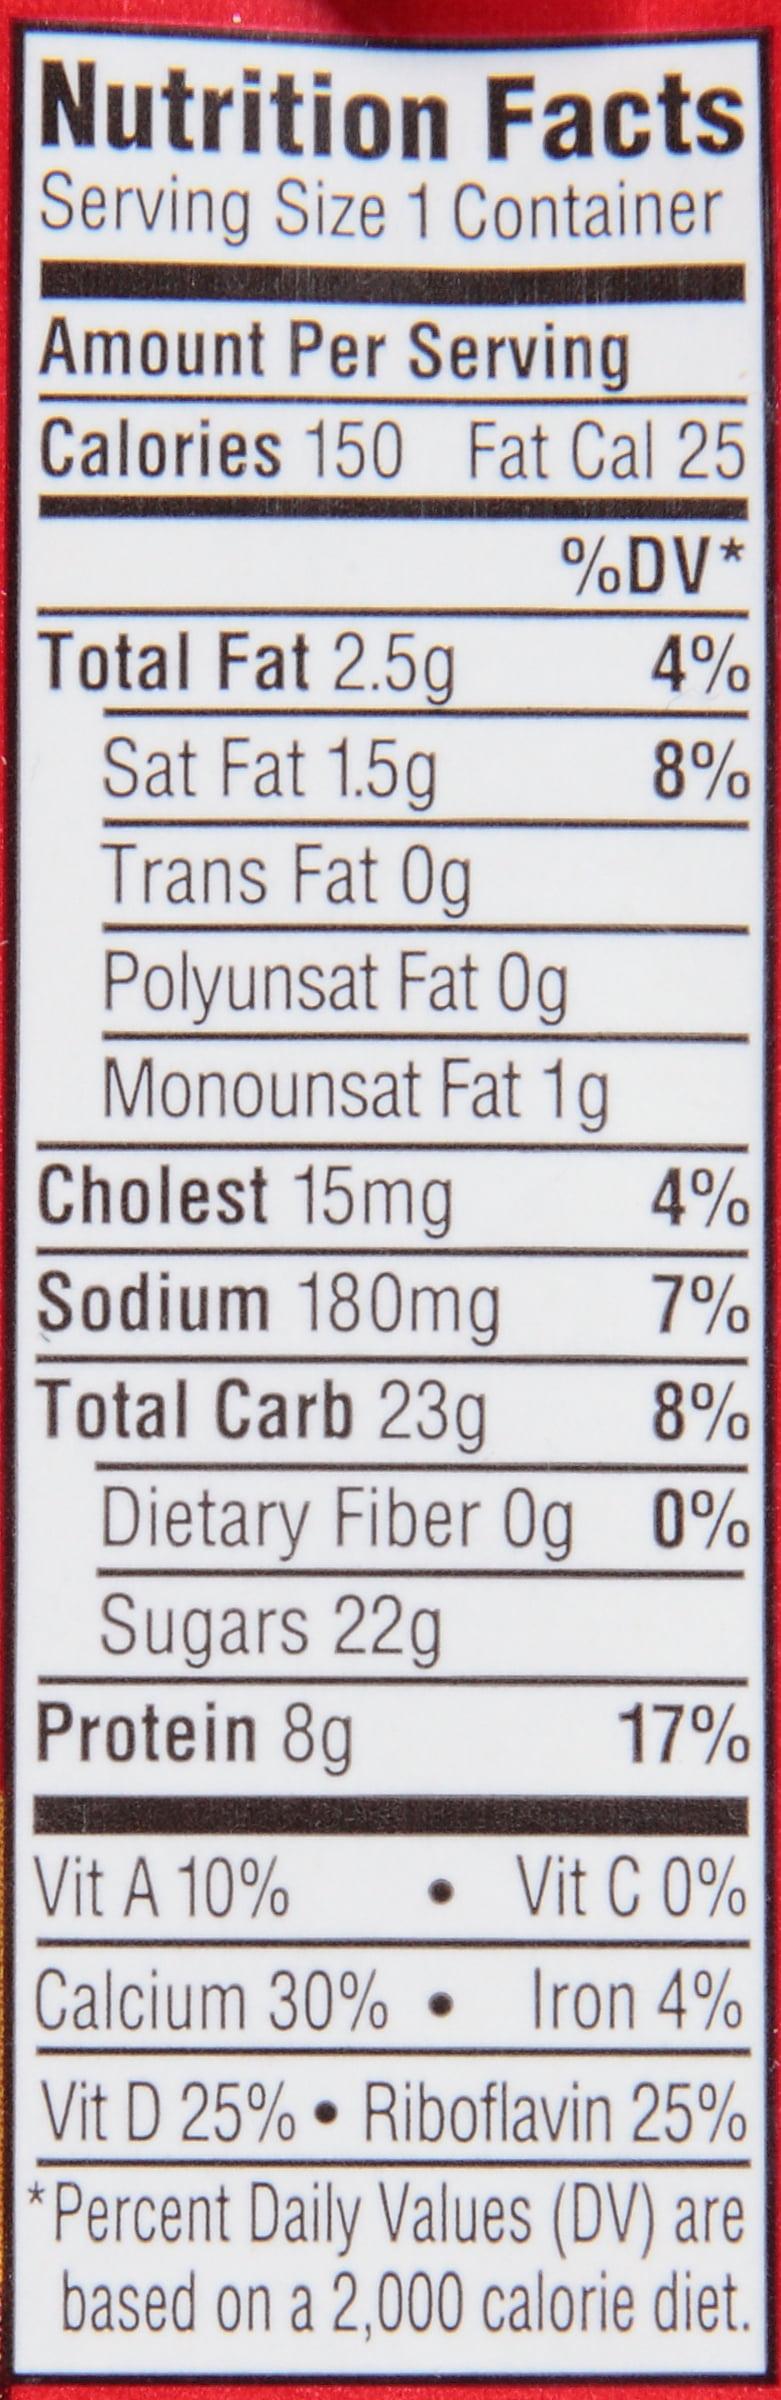 Milk 95% Organic Chocolate 1% Lf Asep 6